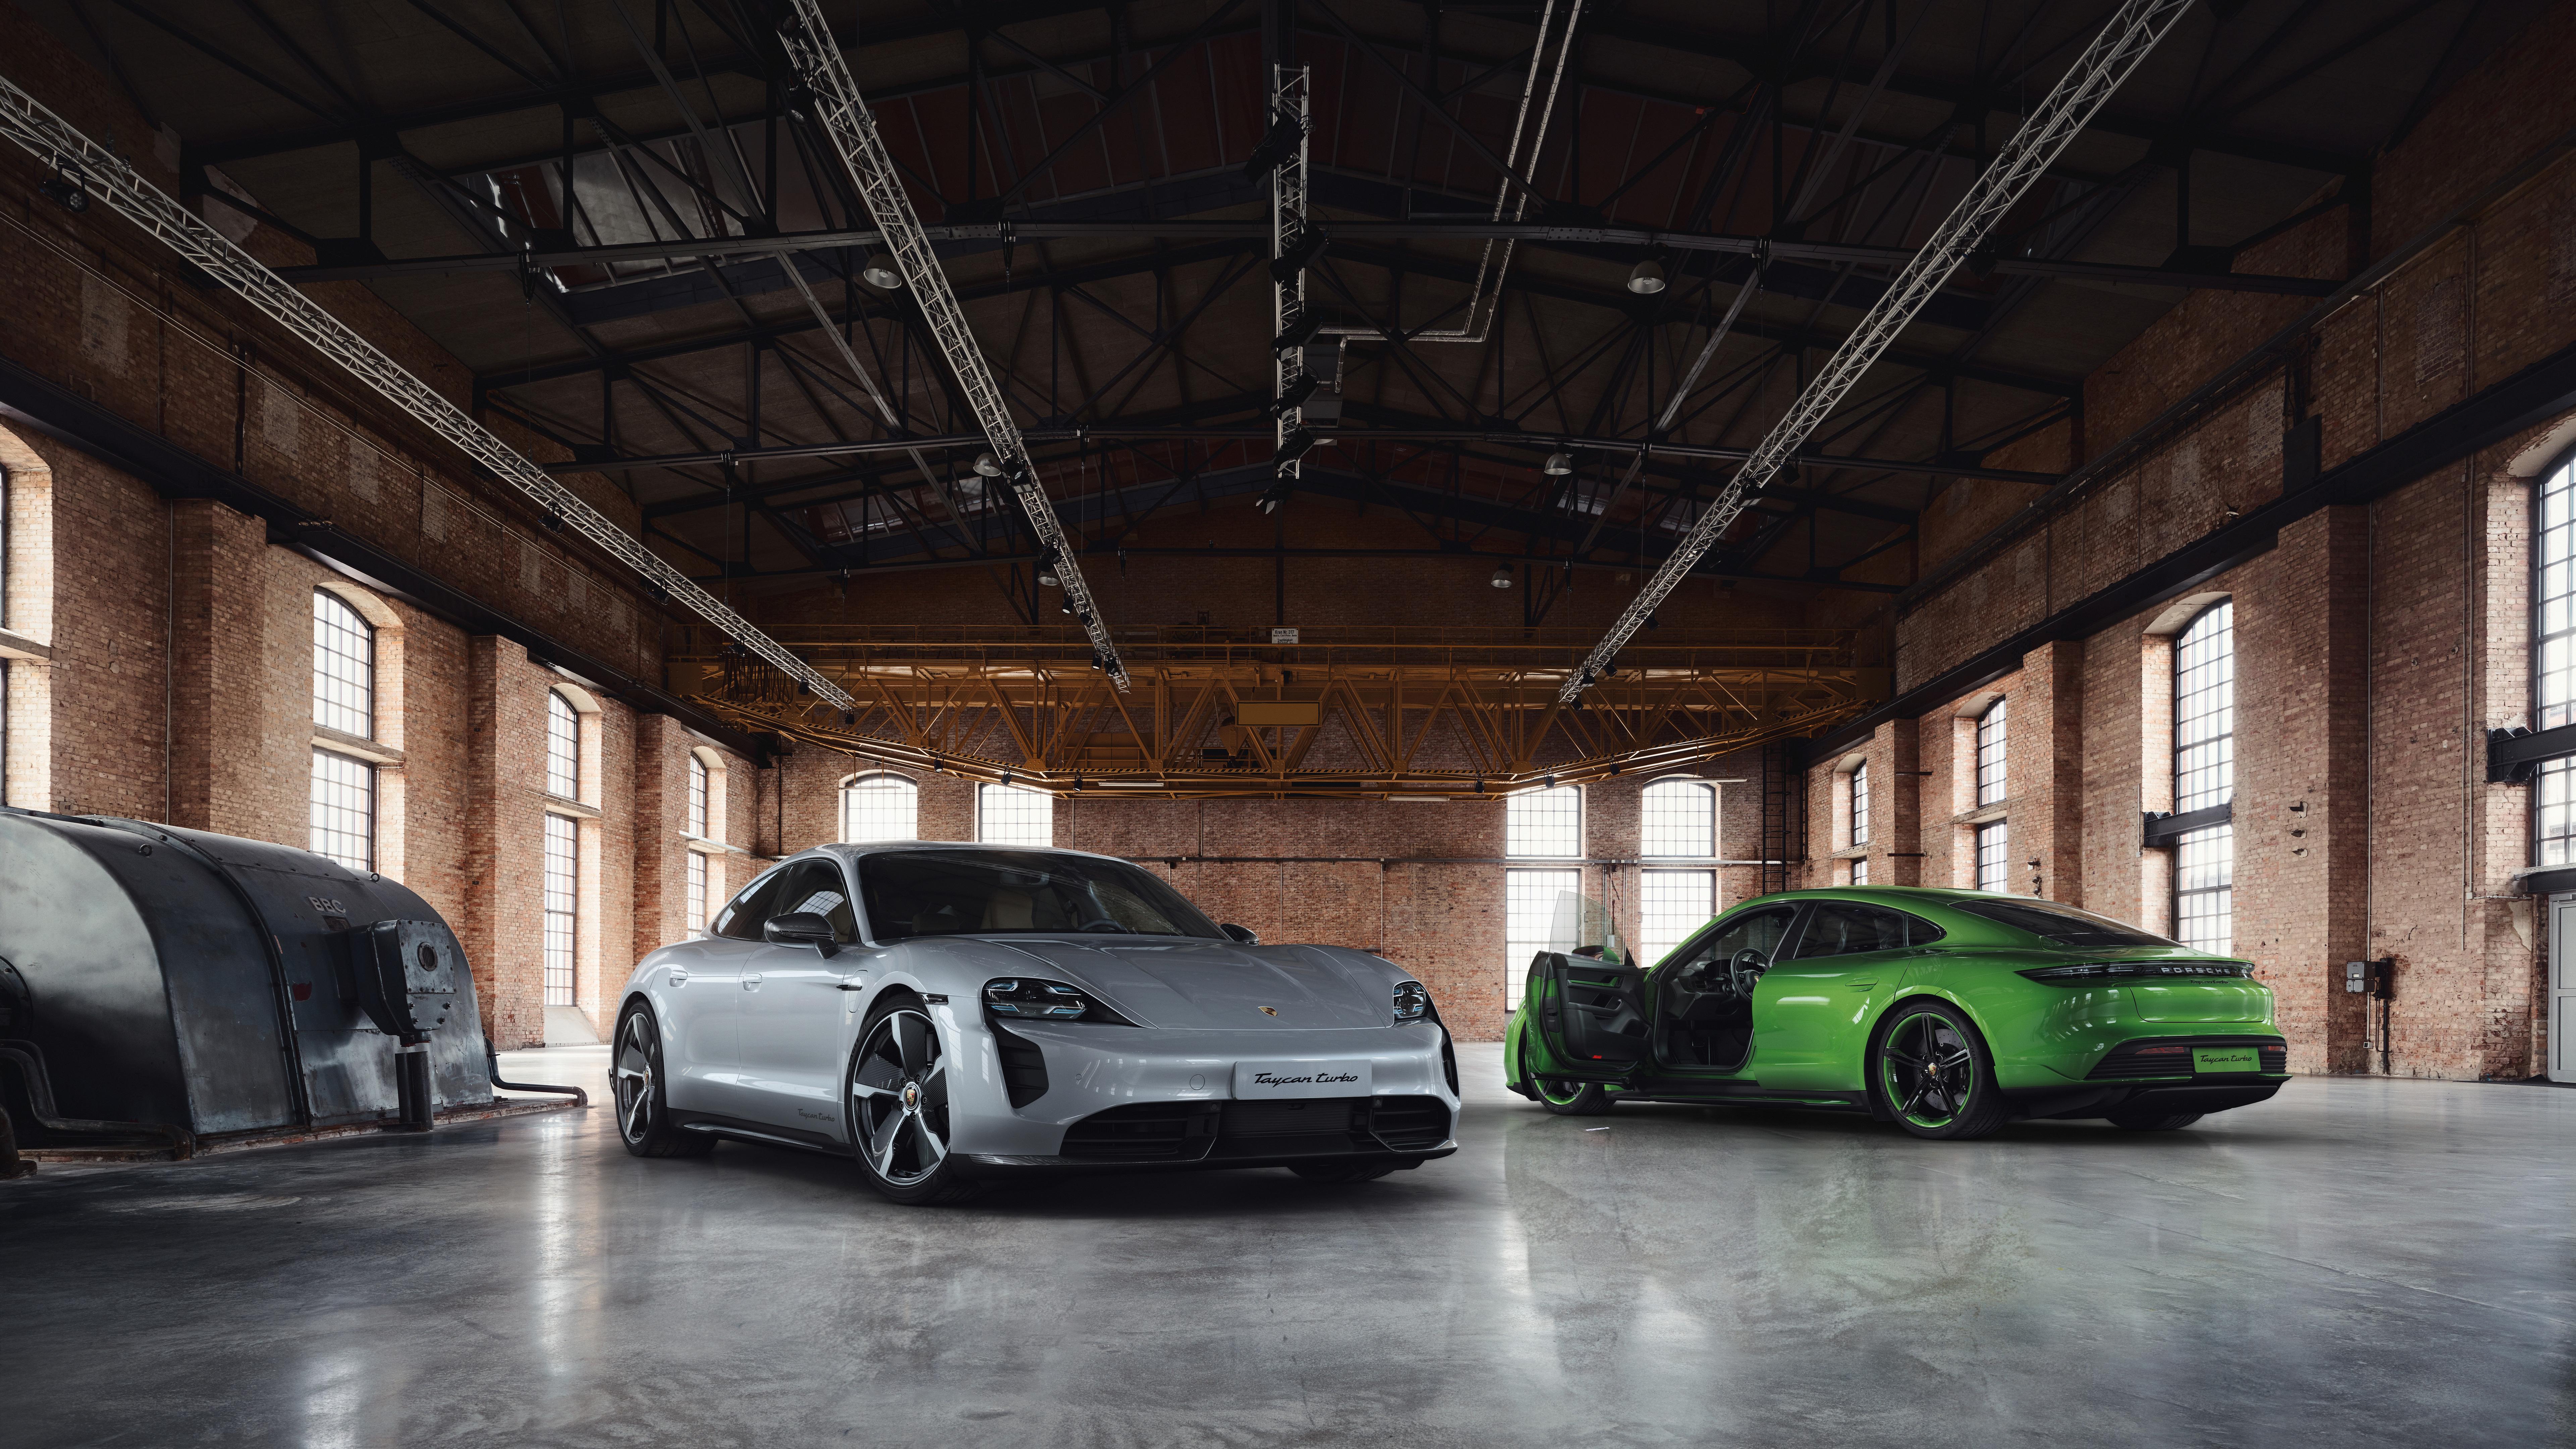 2020-porsche-taycan-turbo-sportdesign-10k-e2.jpg